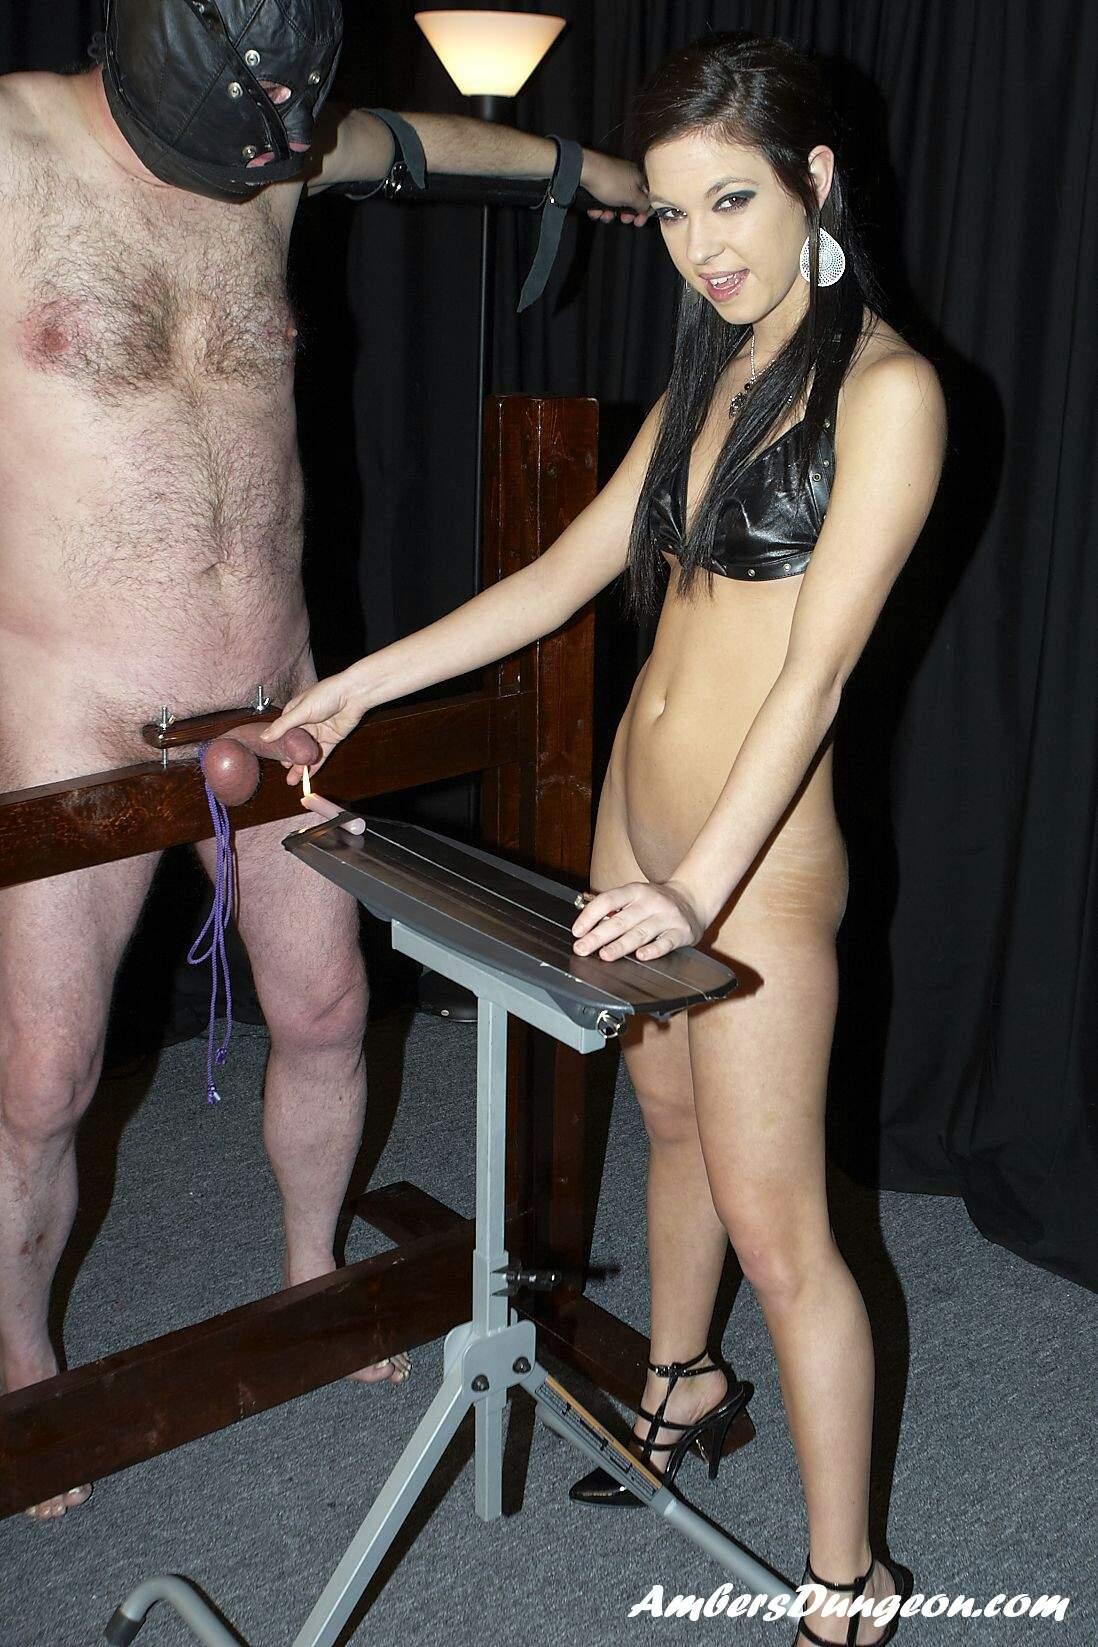 Naughty blonde tattooed spanking her ass 9